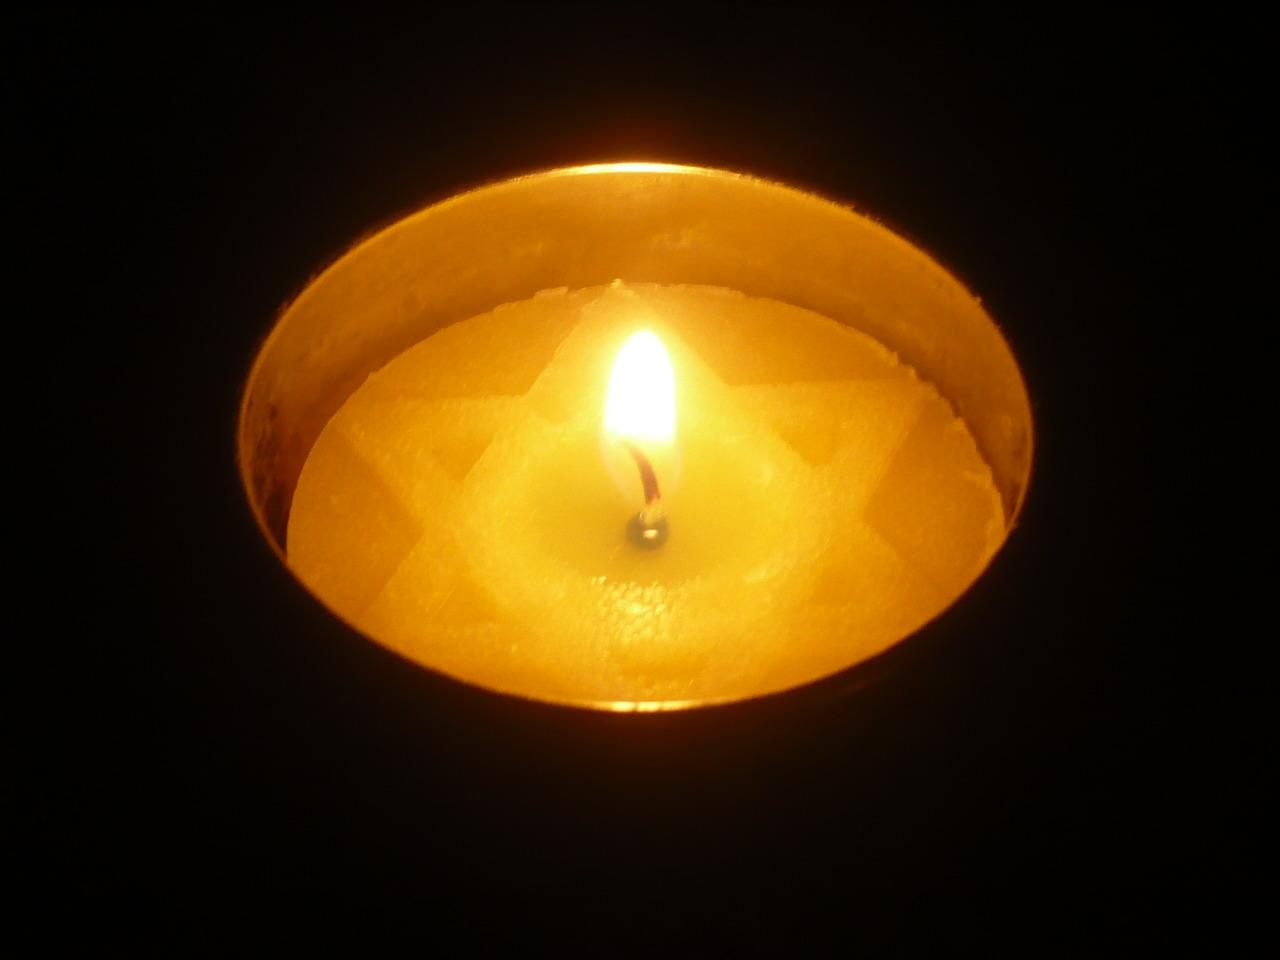 fc50c26d9e2a290019d6_Yom_Hashoah_candle.jpg